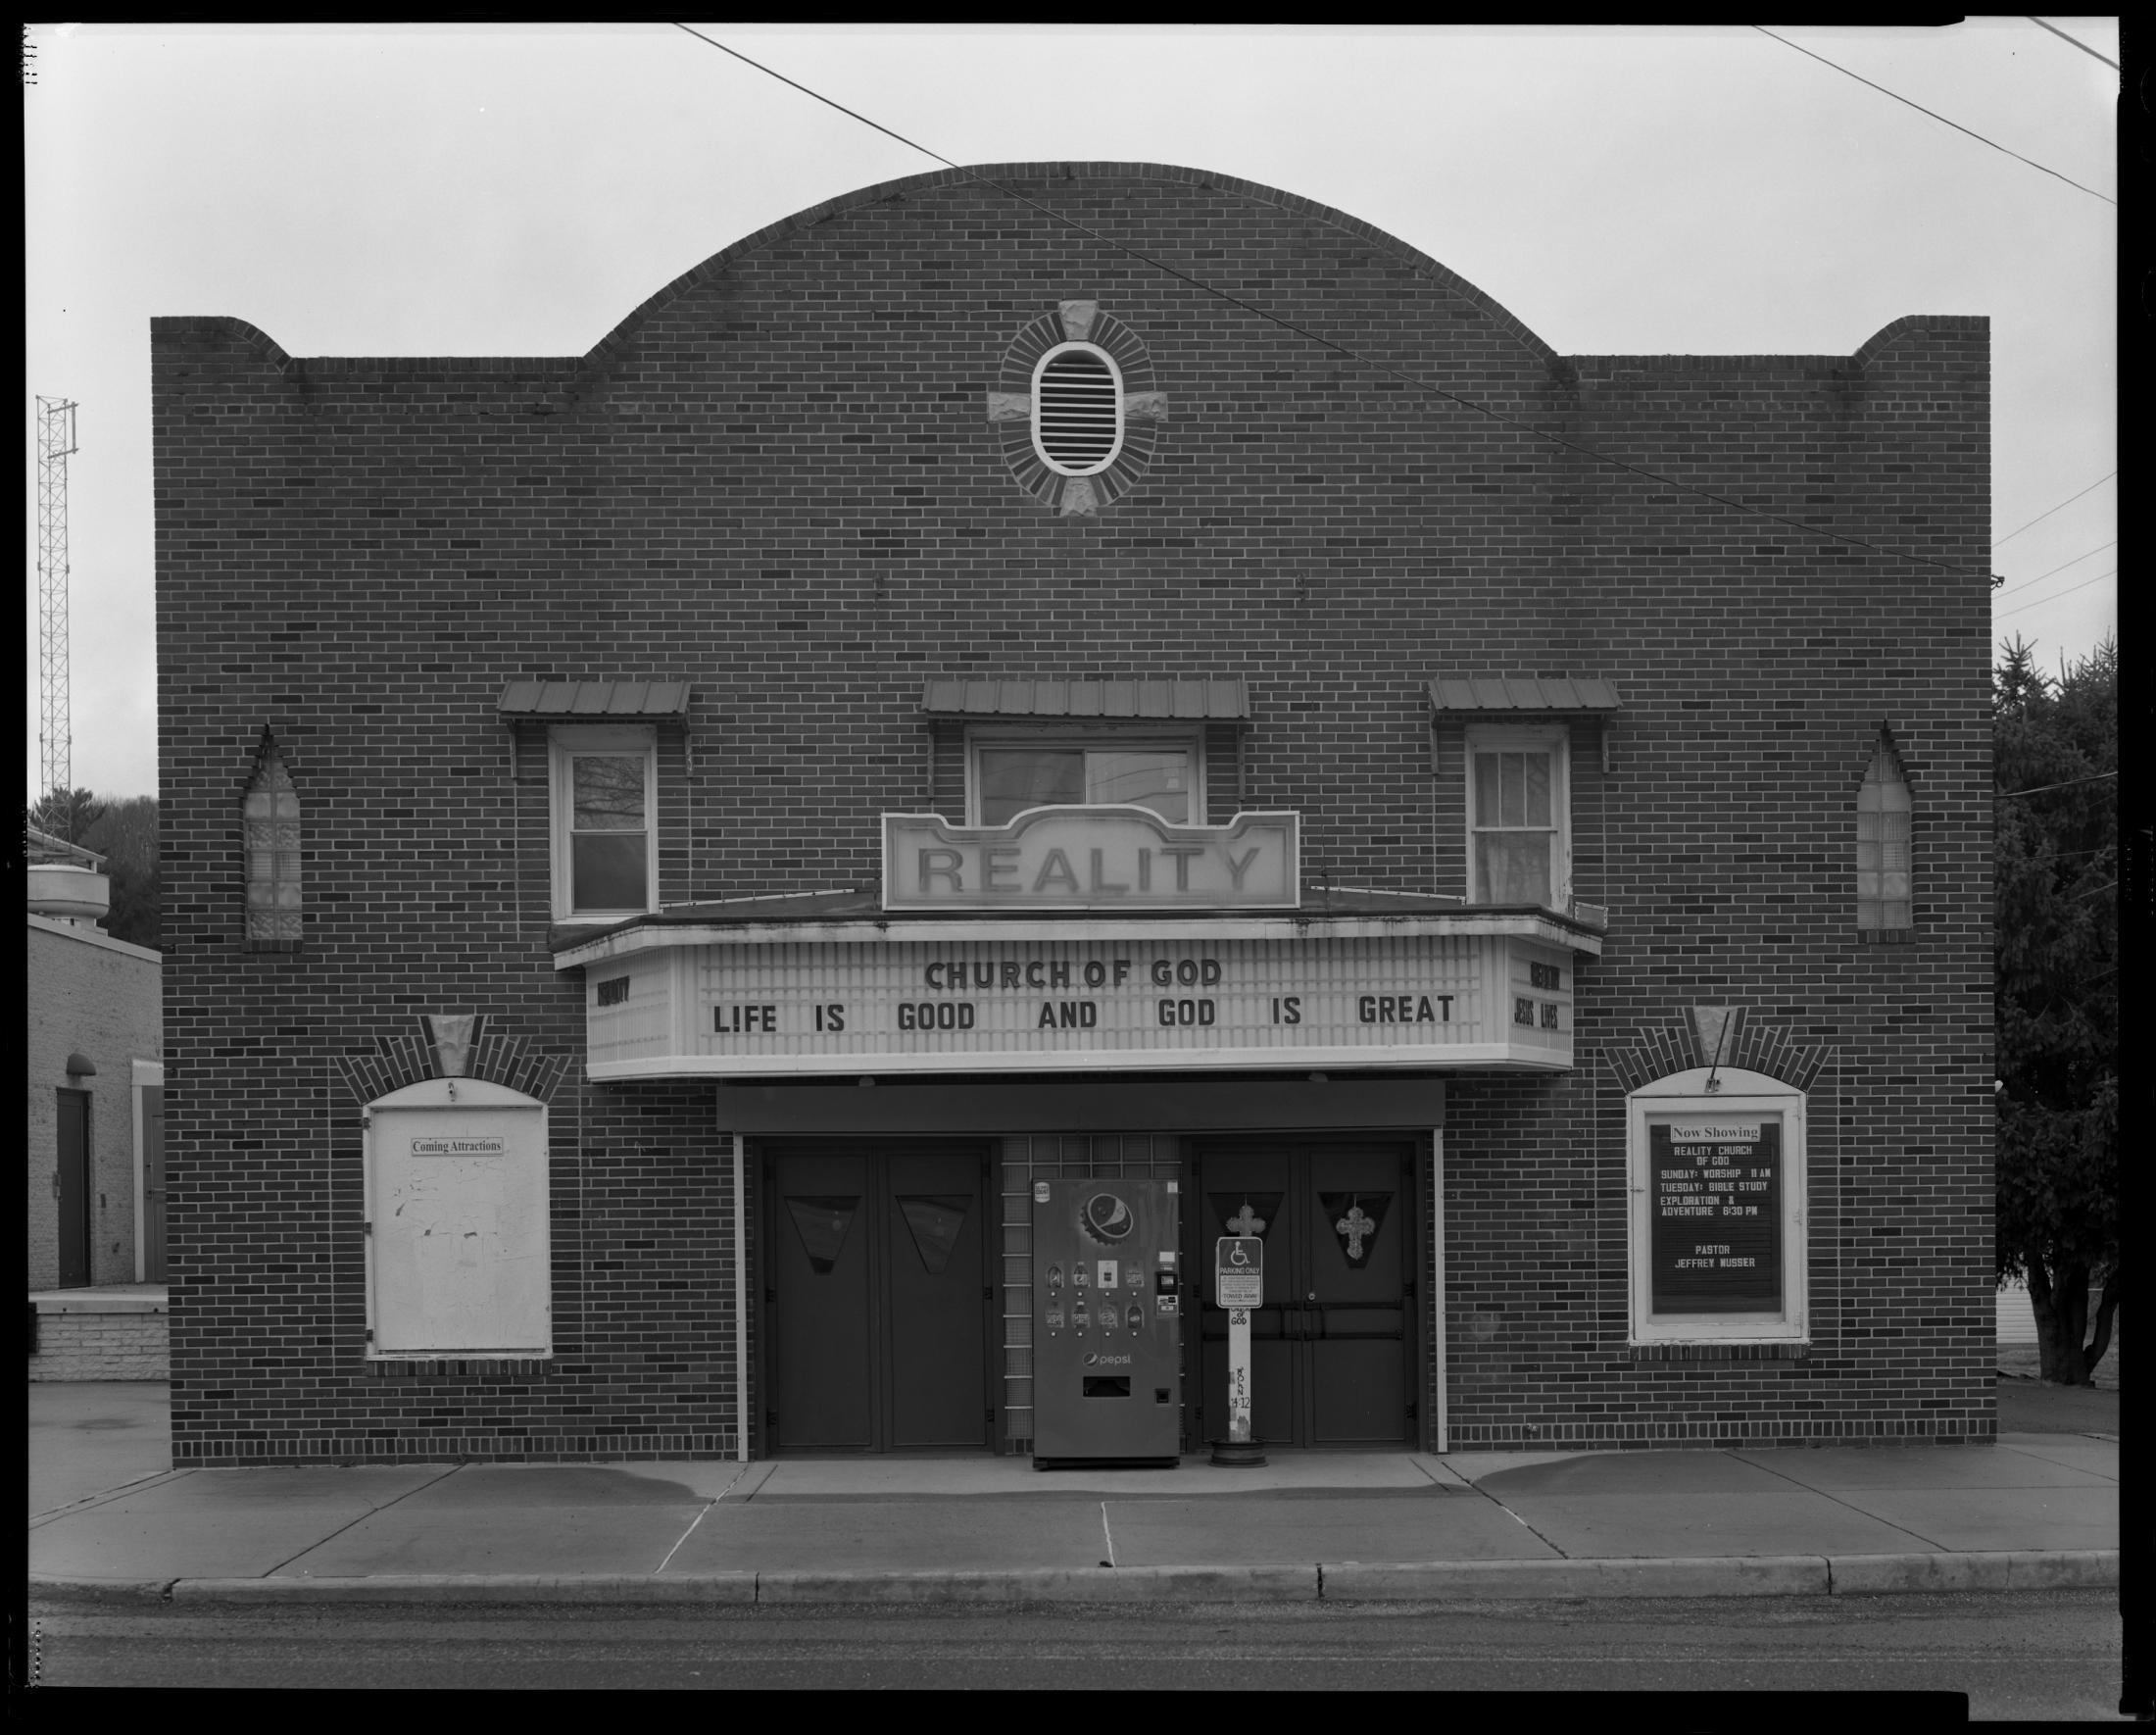 Reality Church, Pennsylvania, 2020